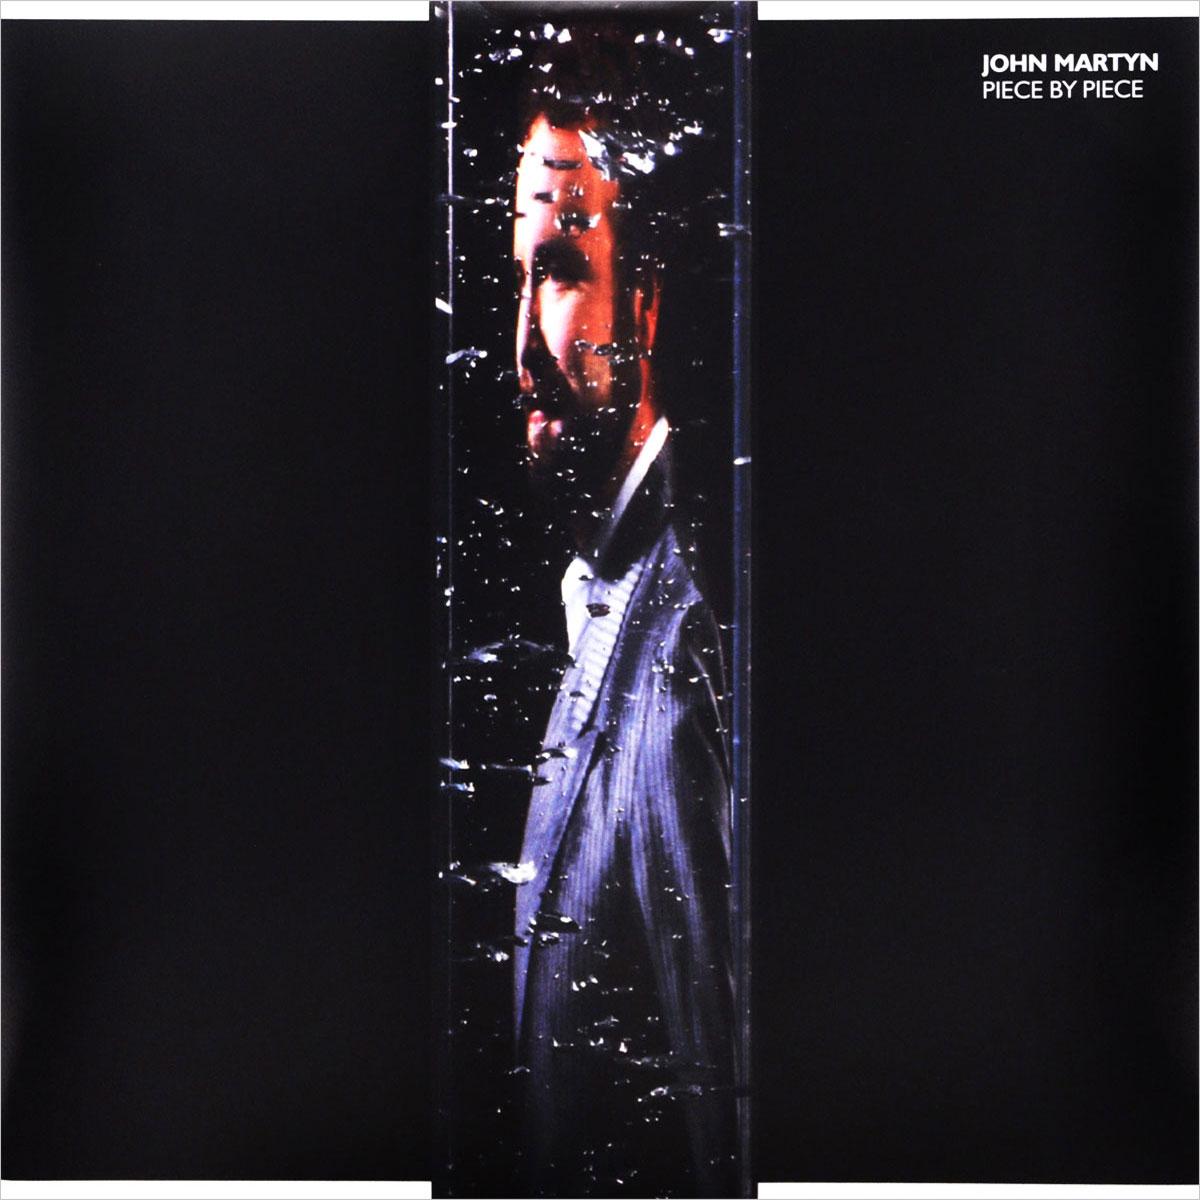 Джон Мартин John Martyn. Piece By Piece (2 LP) джон мартин john martyn sapphire 2 lp